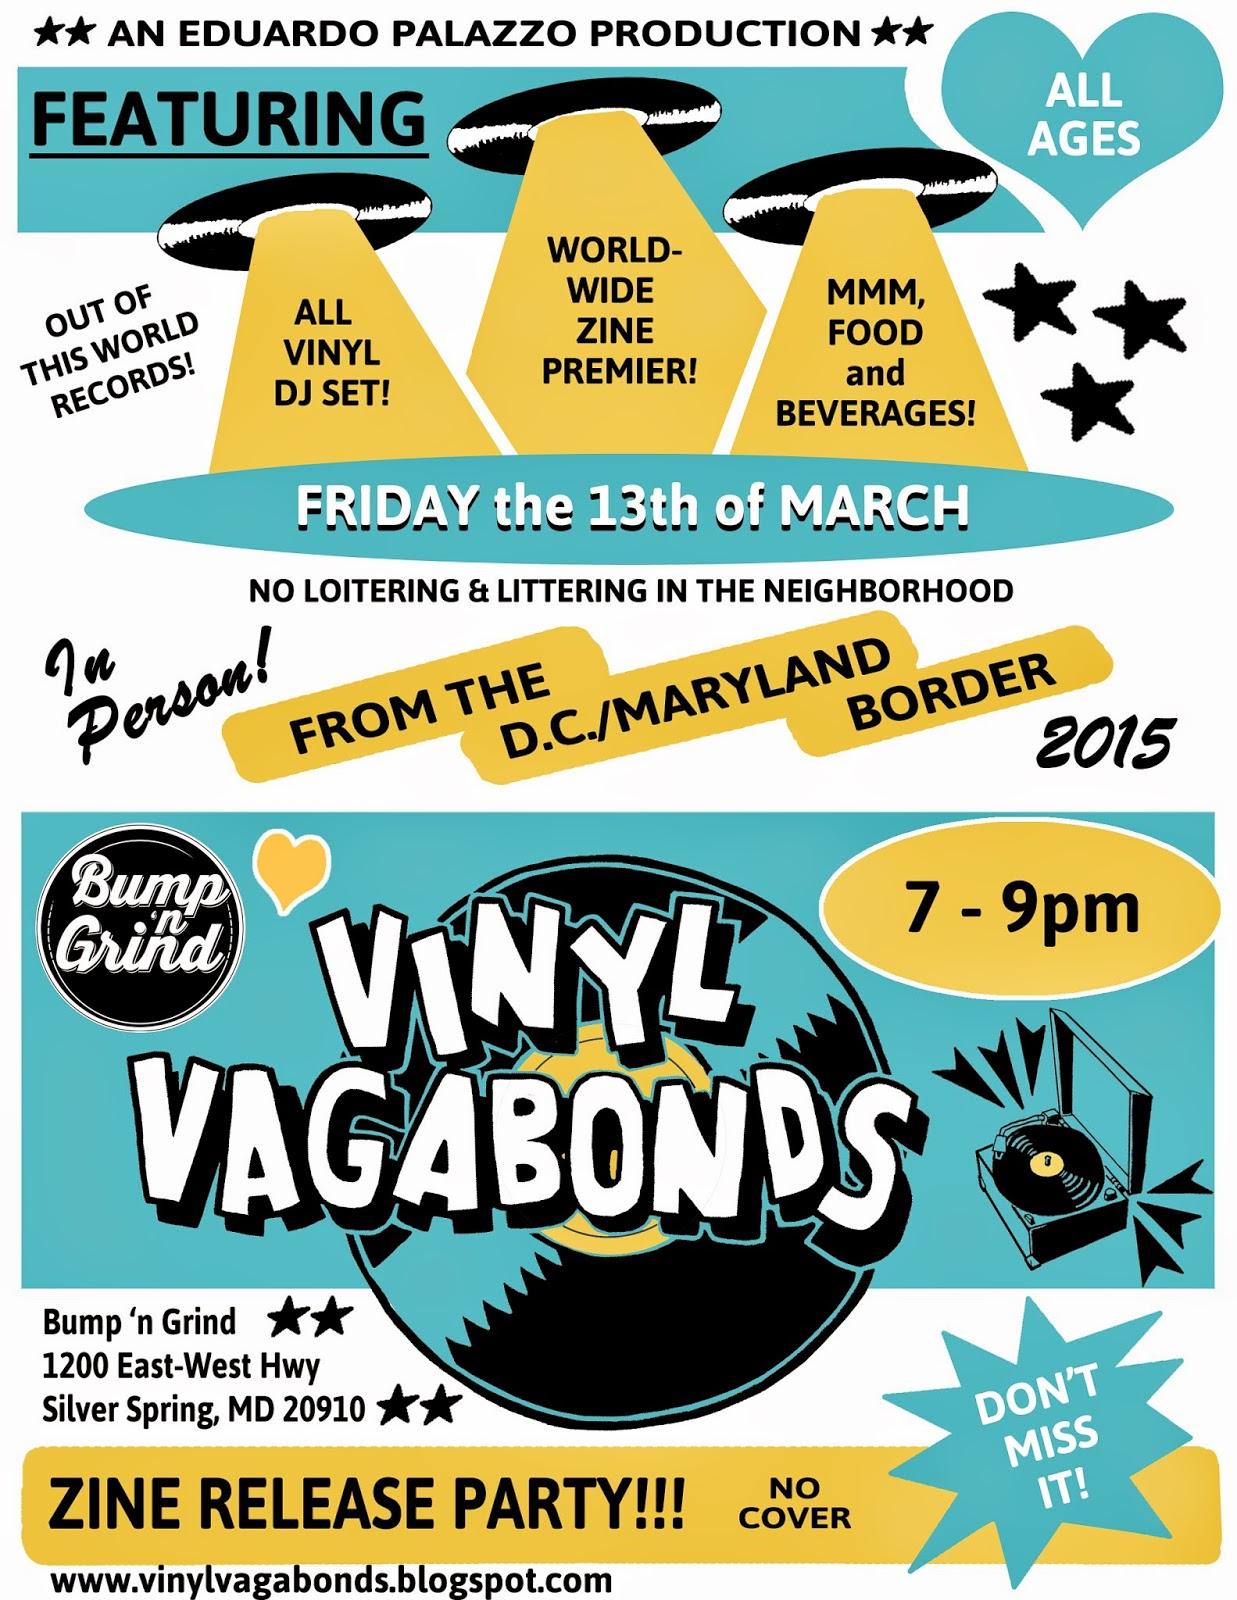 Vinyl Vagabonds